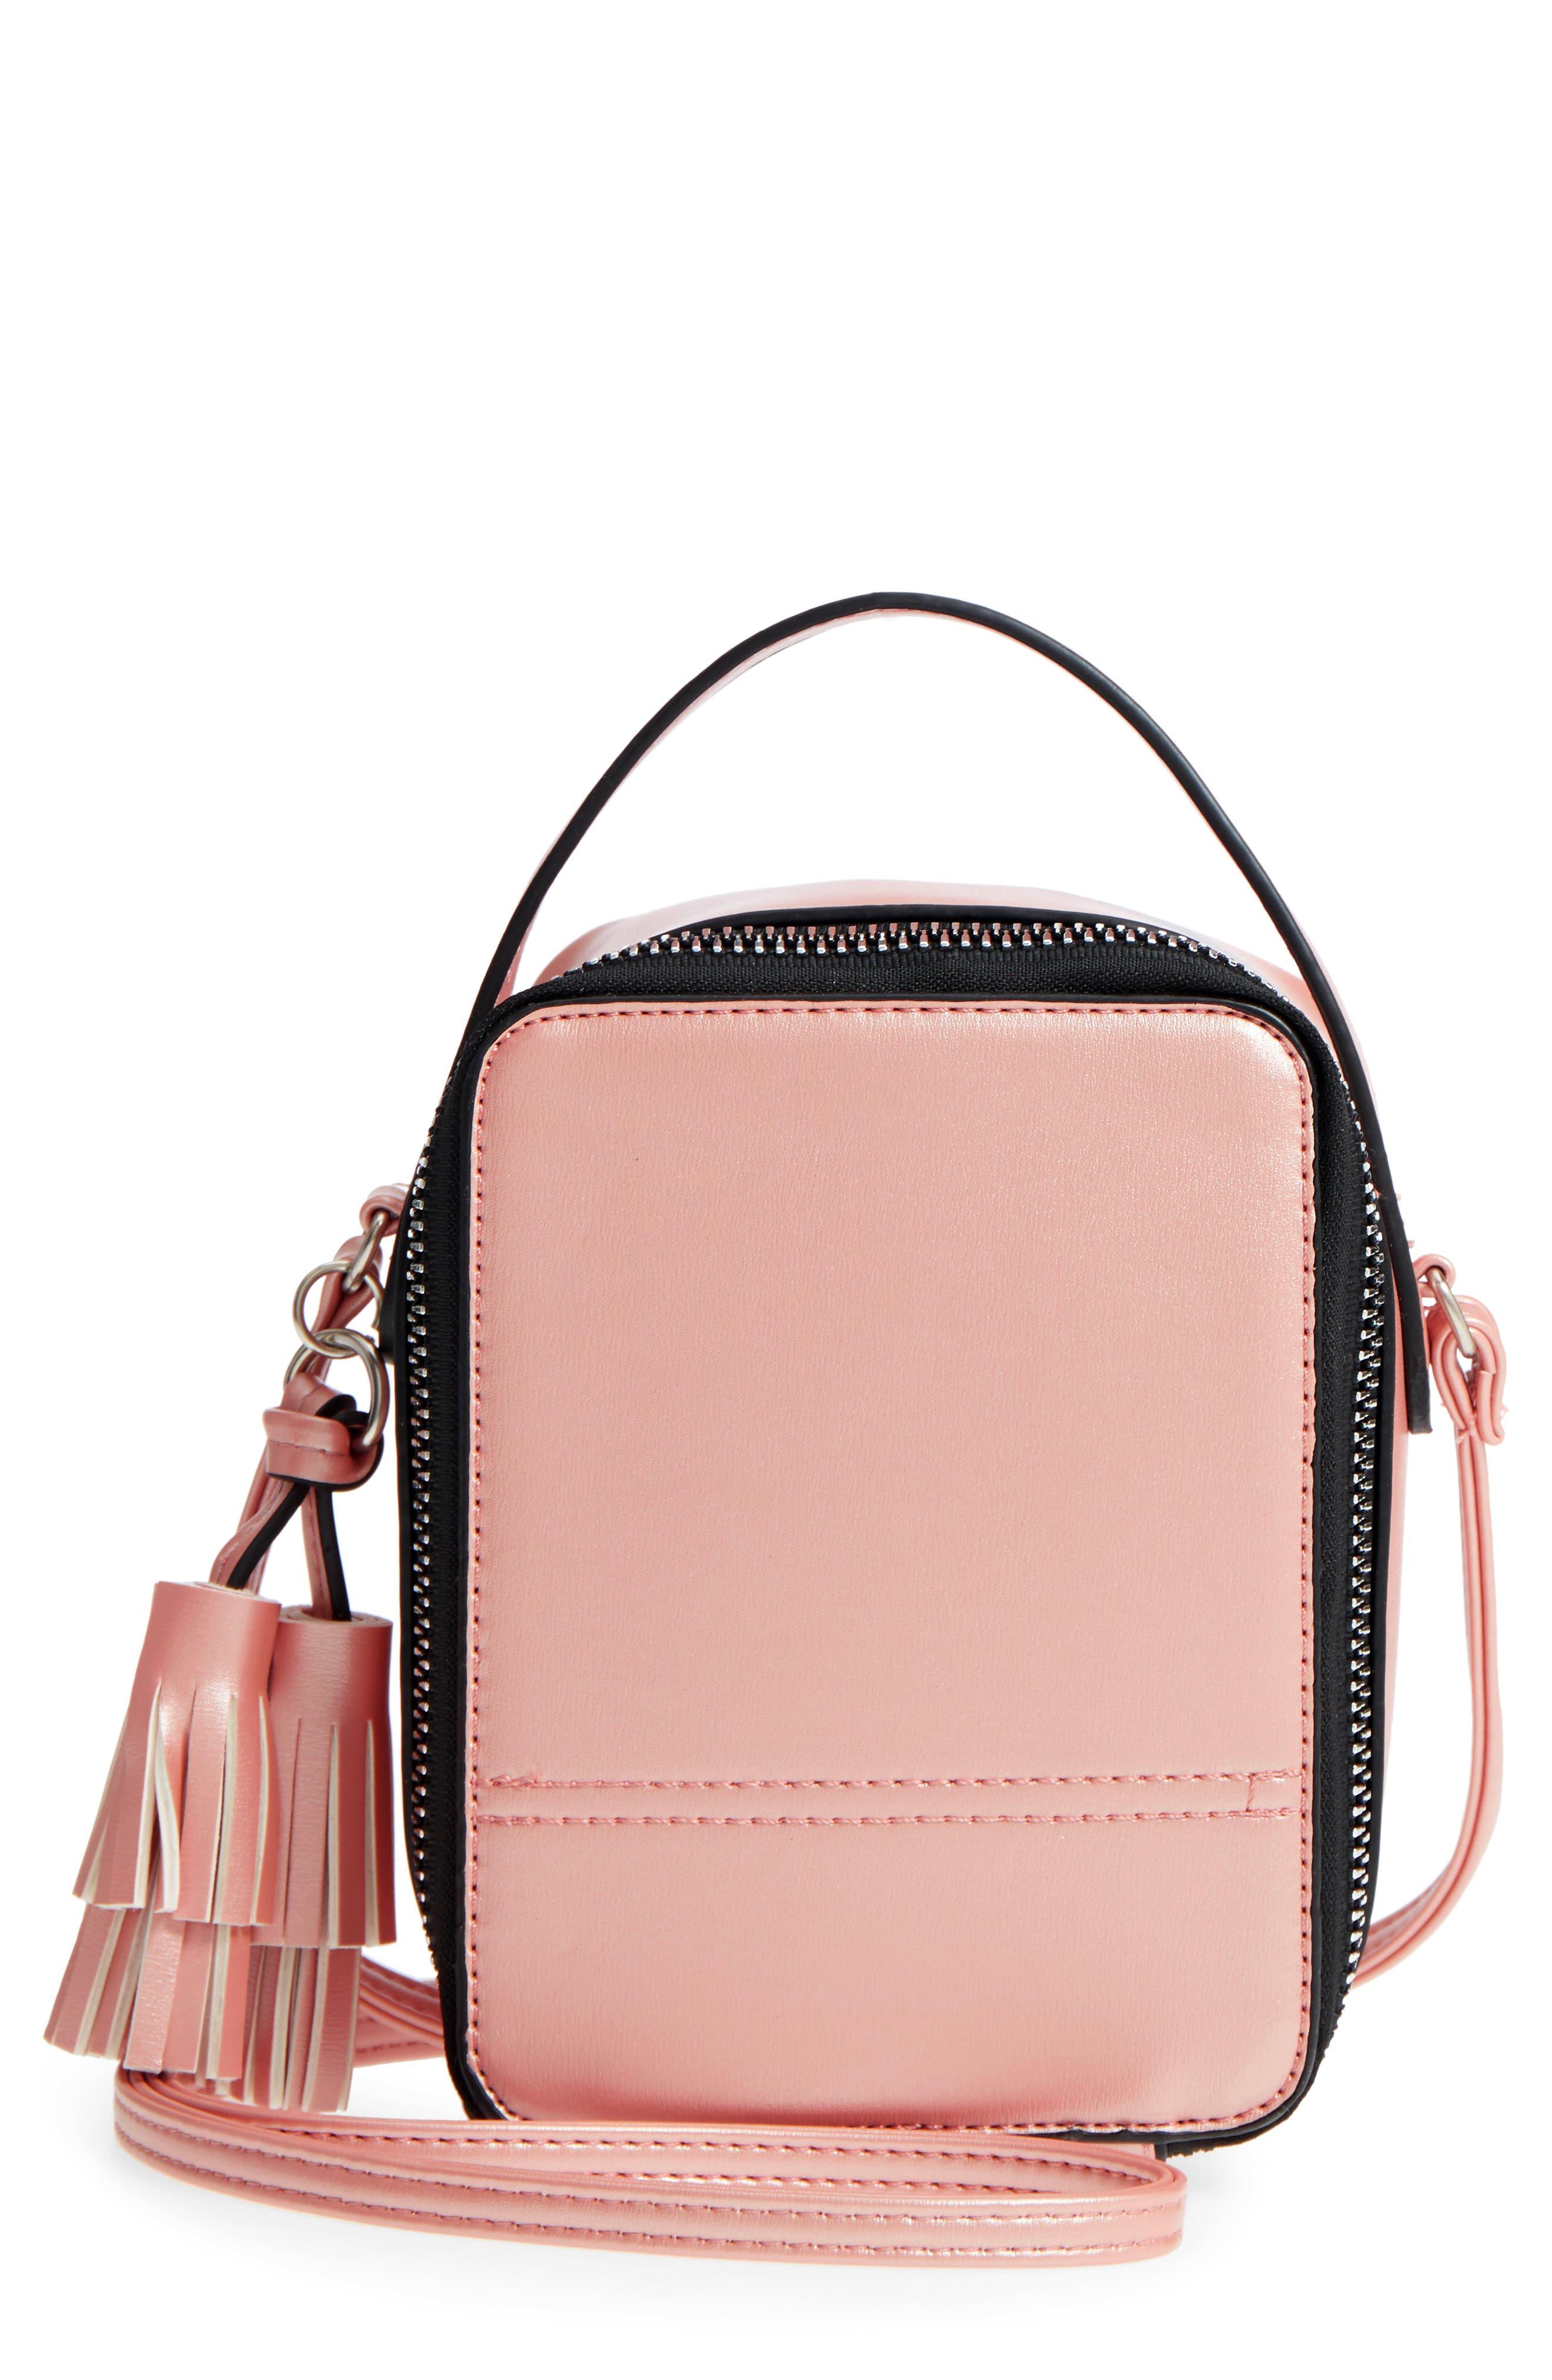 Yoki Bags Tassel Metallic Faux Leather Box Bag